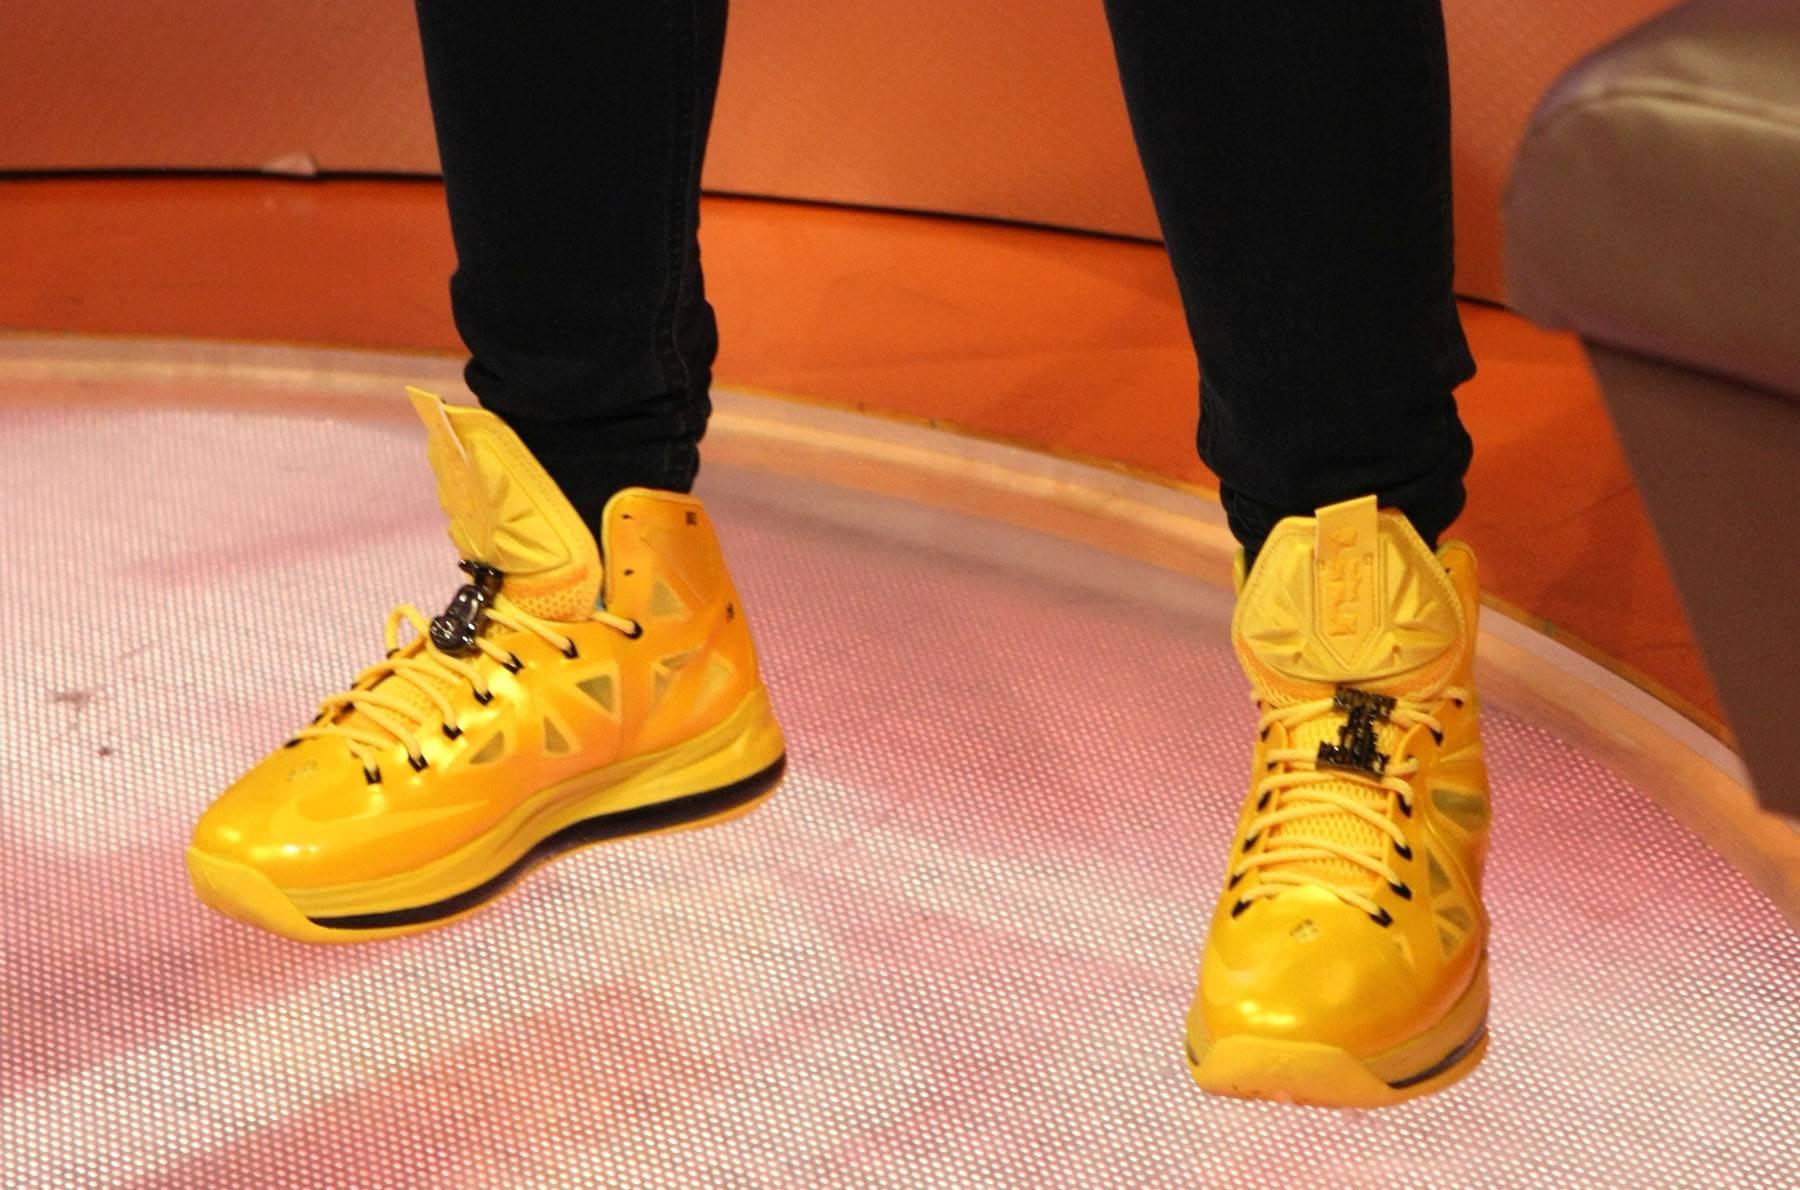 Mustard - Angela Simmons rocks the mustard sneaks on 106. (Photo: Bennett Raglin/BET/Getty Images for BET)